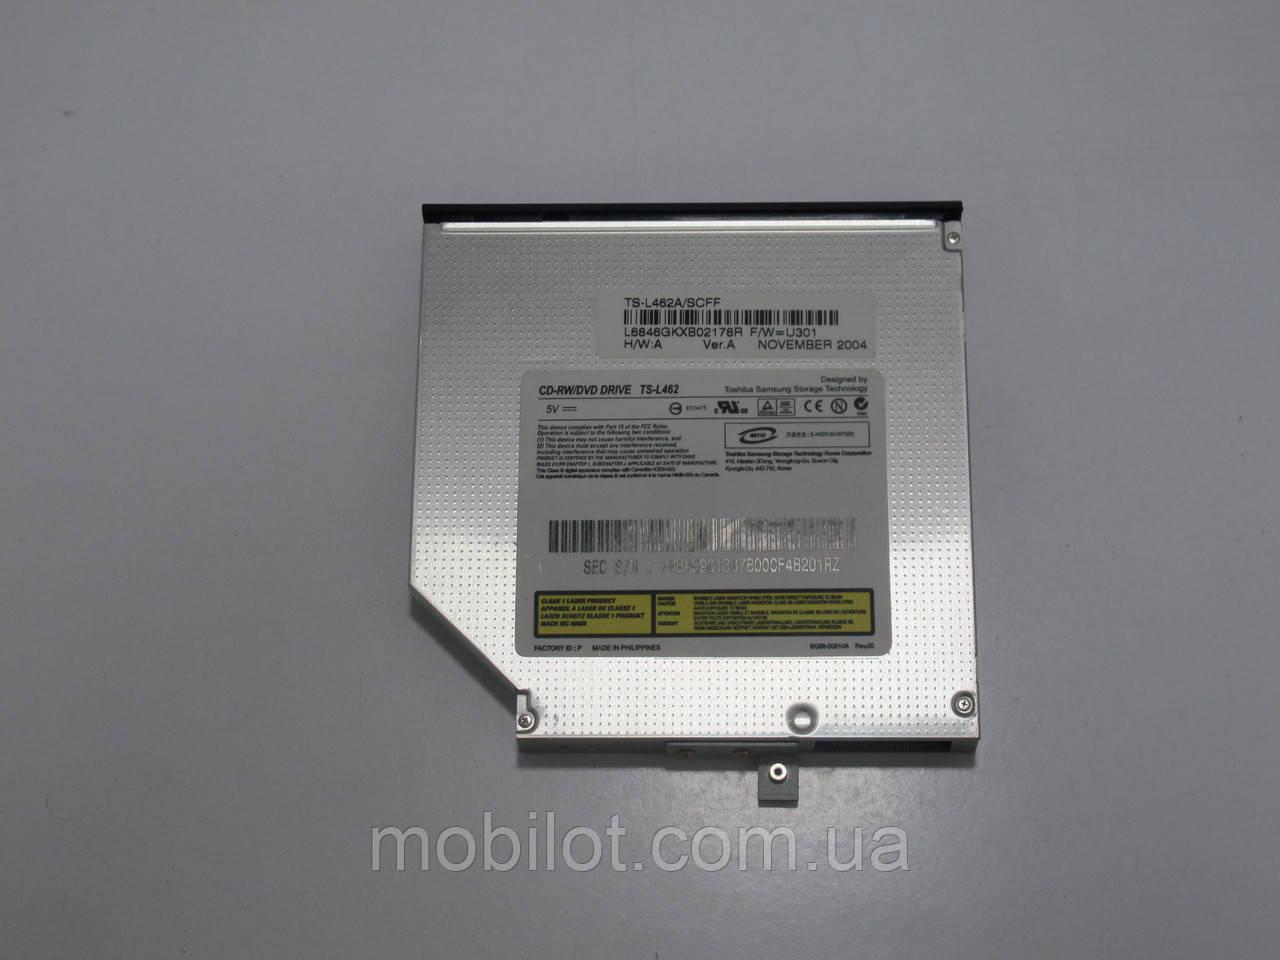 Оптический привод Samsung P28 (NZ-6370)